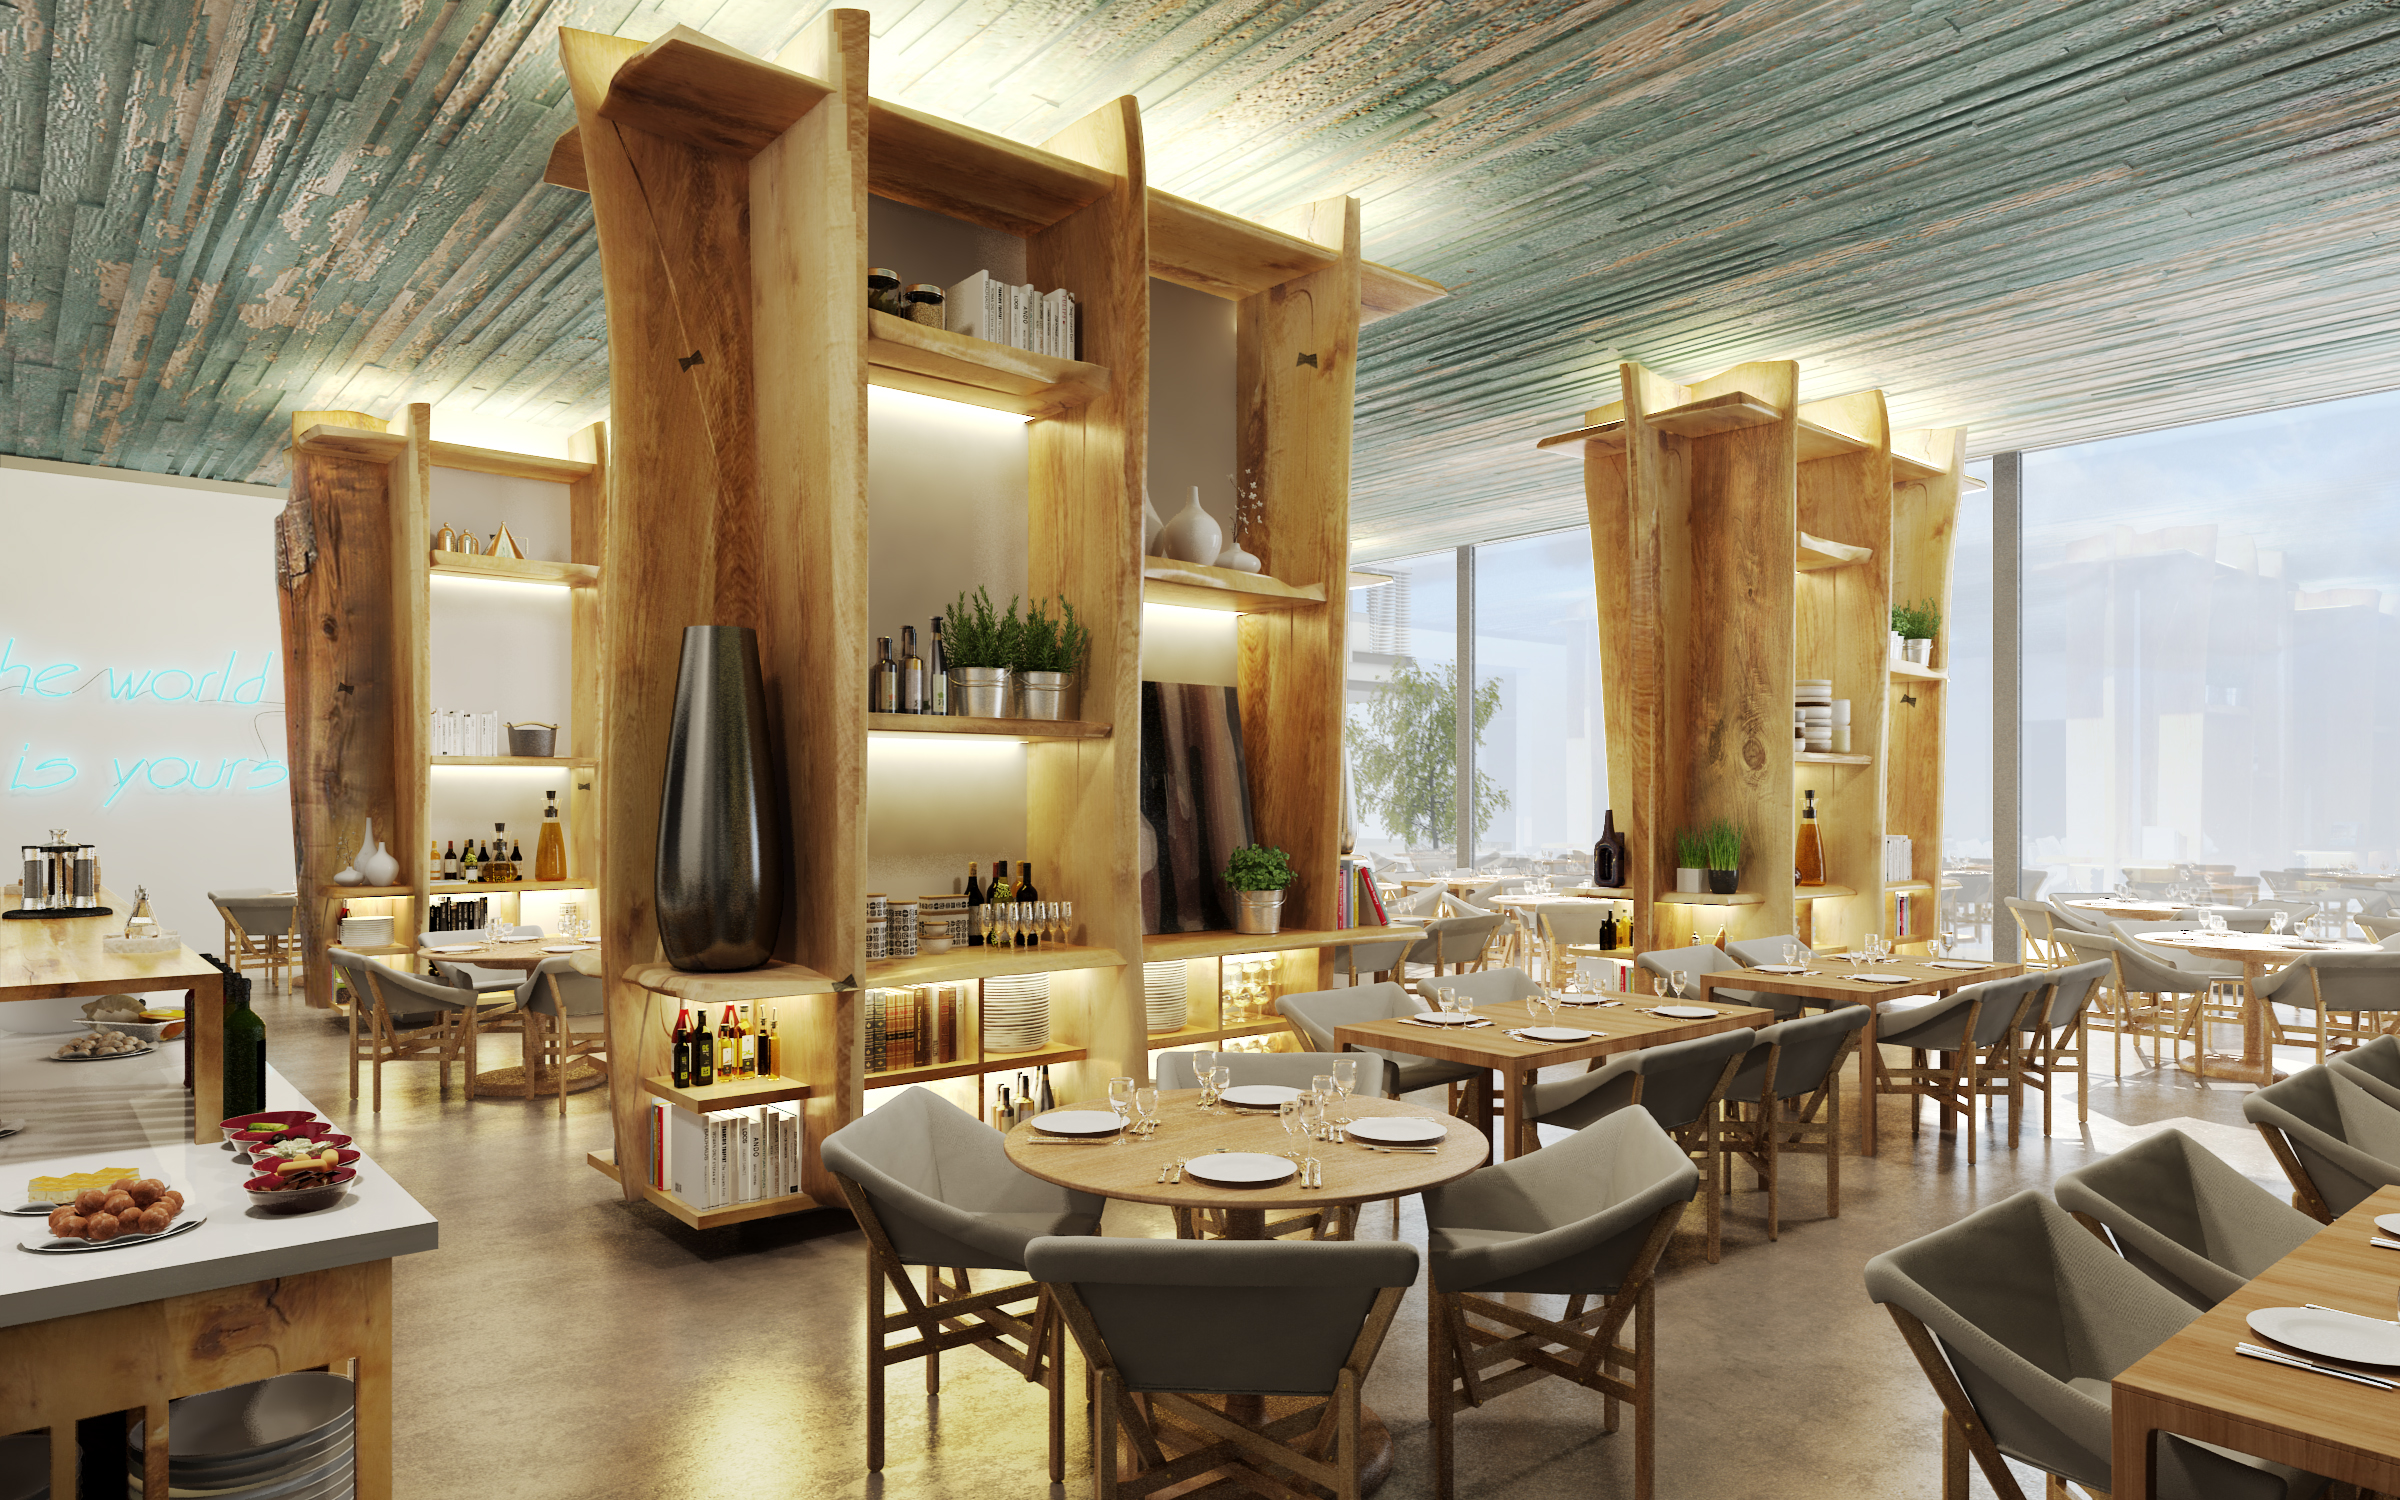 nikki beach resort spa dubai announces its debut in december 2016 - Beach Style Restaurant 2016